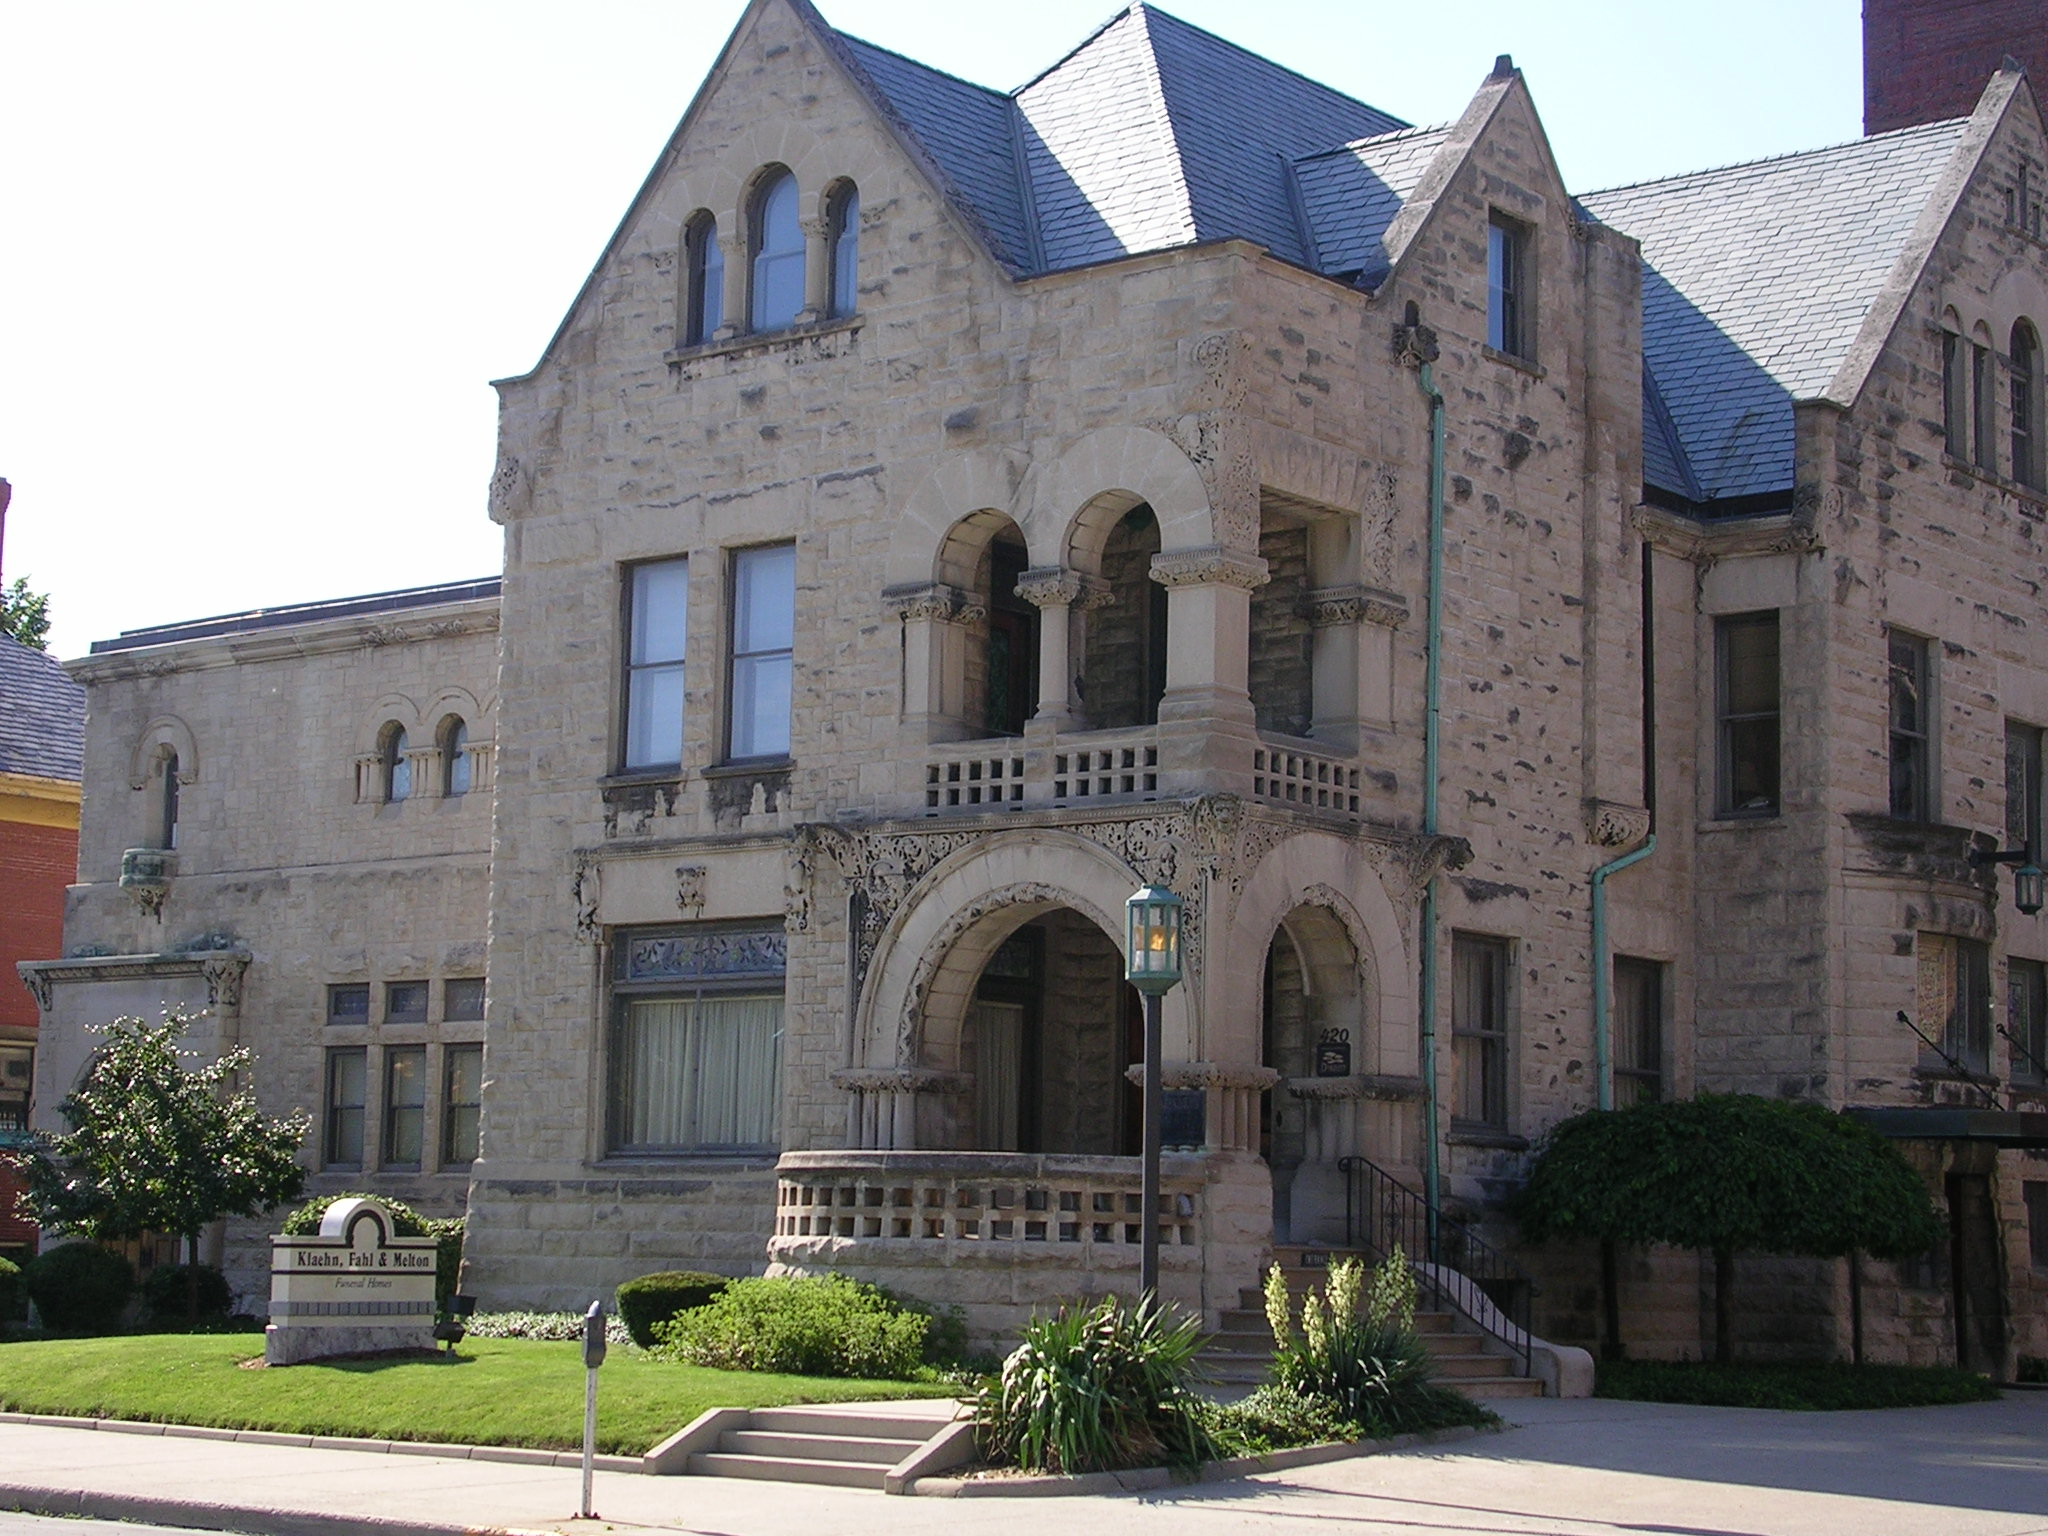 Romanesque style houses